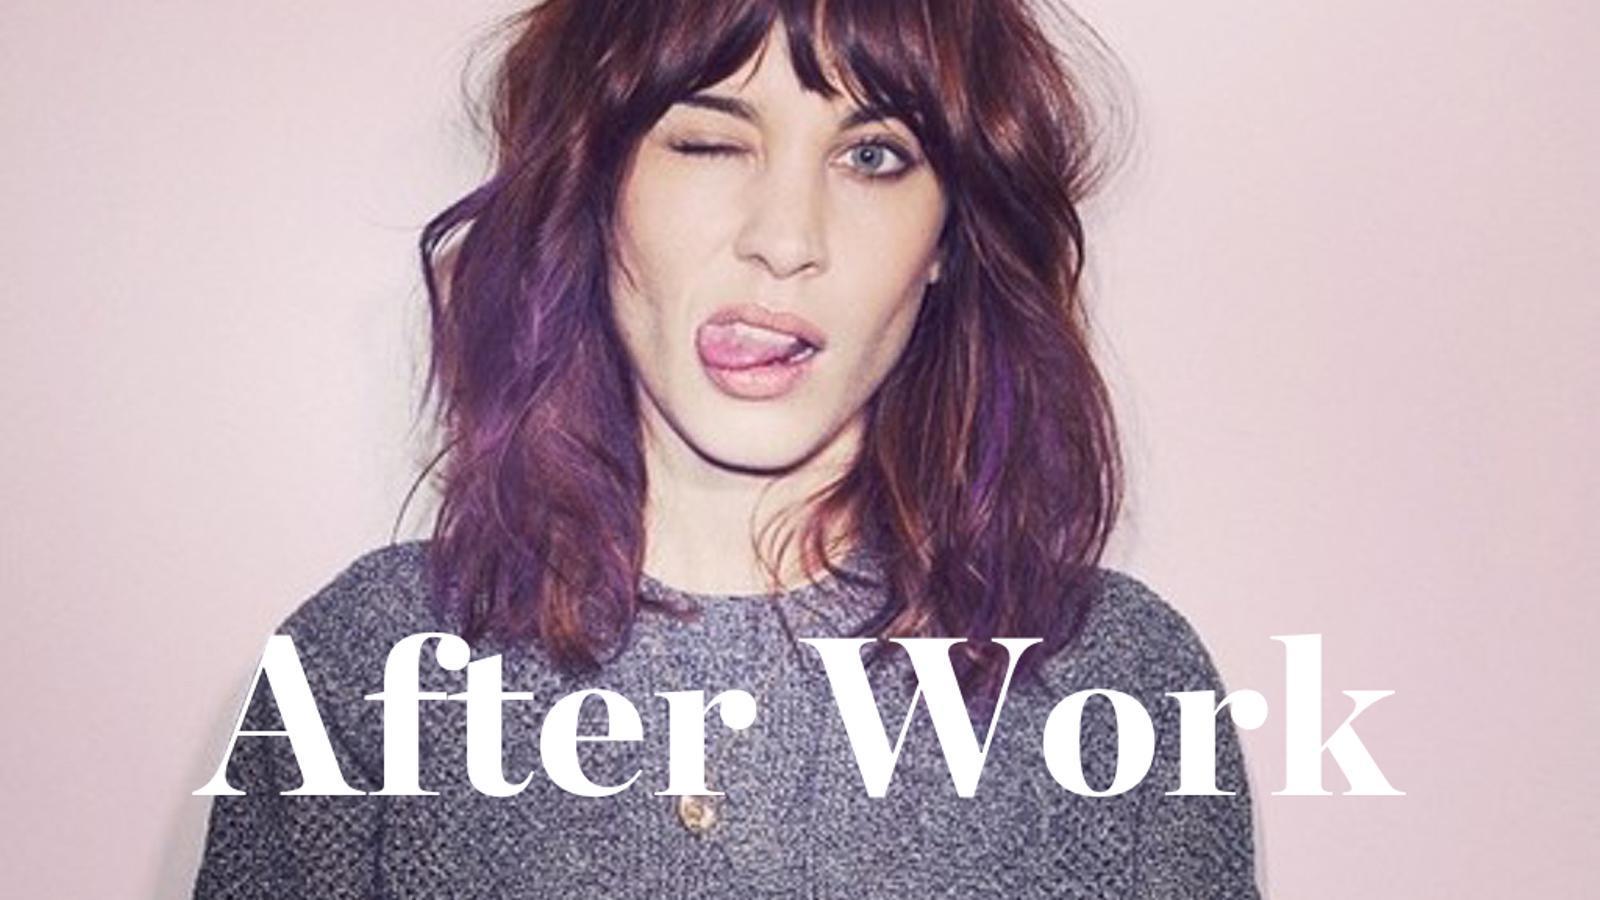 L'After Work d'Antoni Bassas: Les xifres que mouen les blogueres de moda